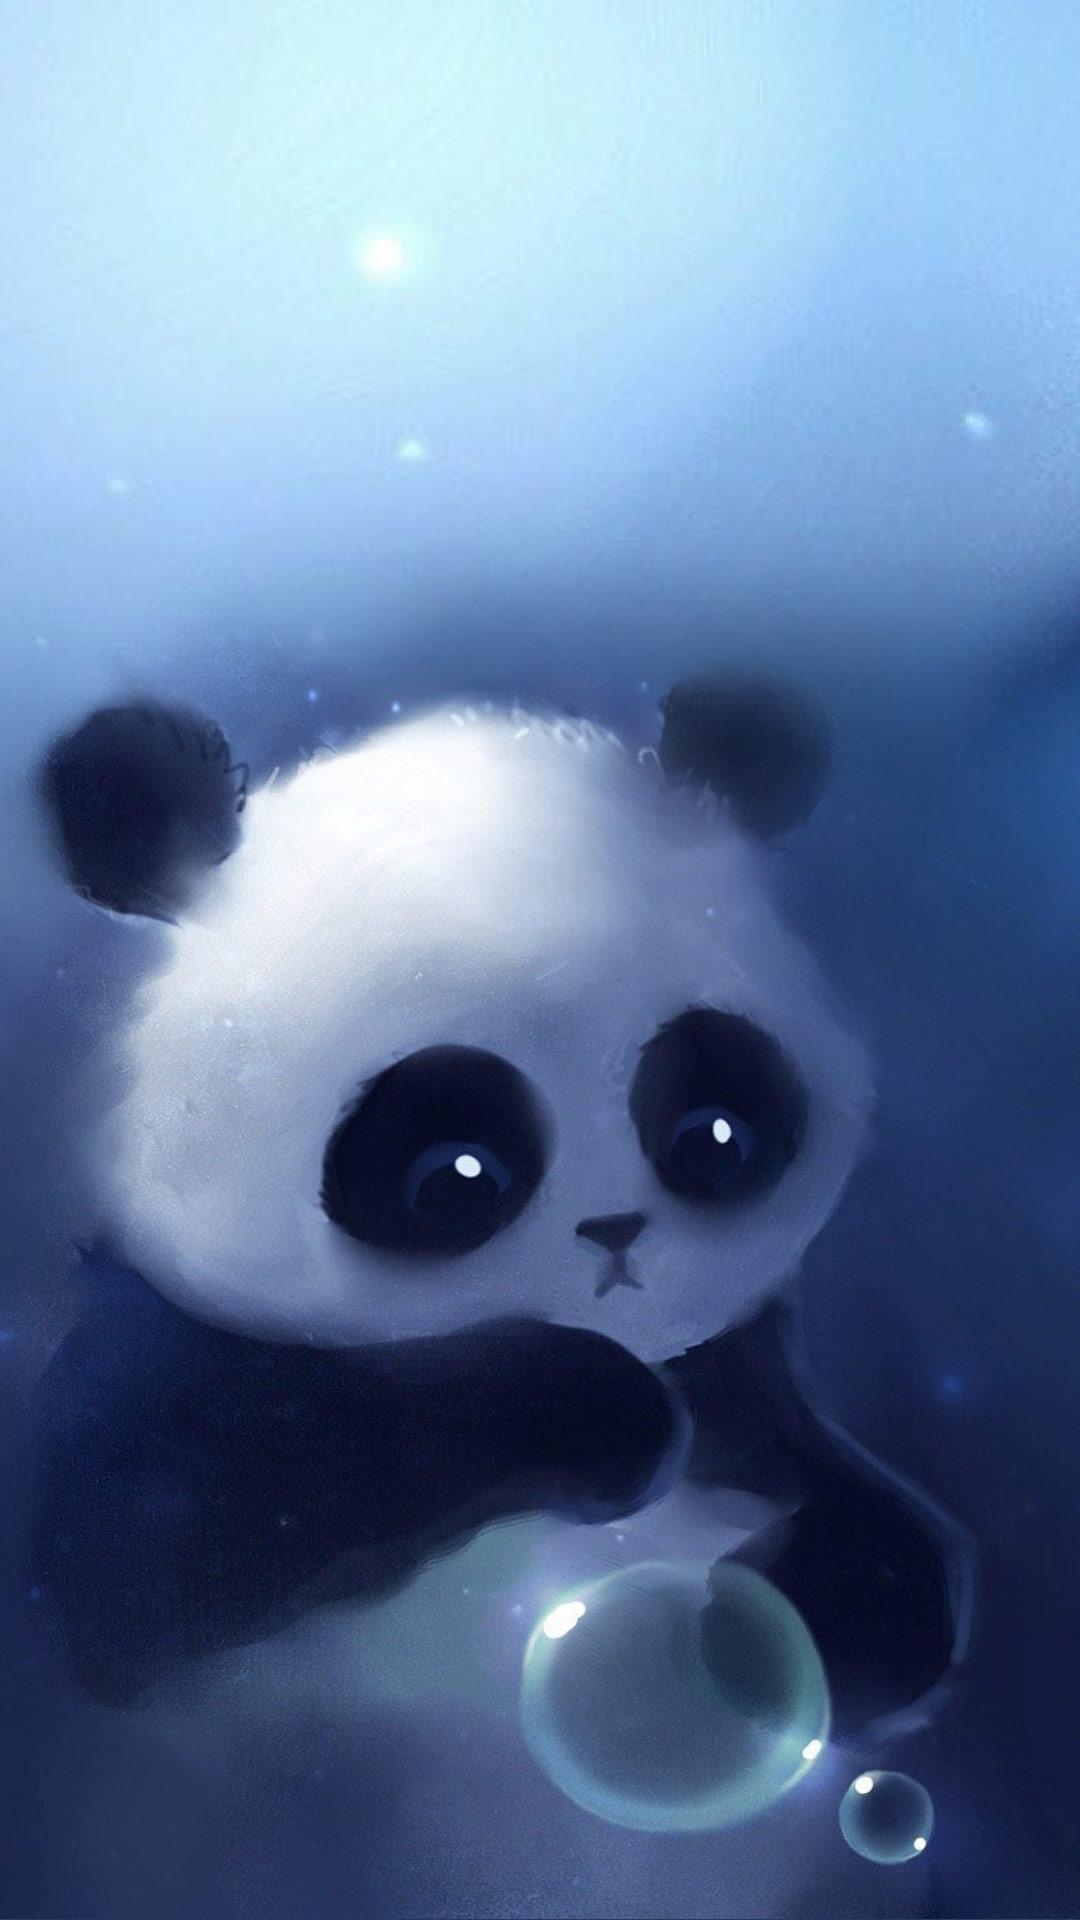 Cute Baby Panda Live Wallpaper For Android Apk Download Baby Wallpaper Cute Panda 1080x1920 Download Hd Wallpaper Wallpapertip